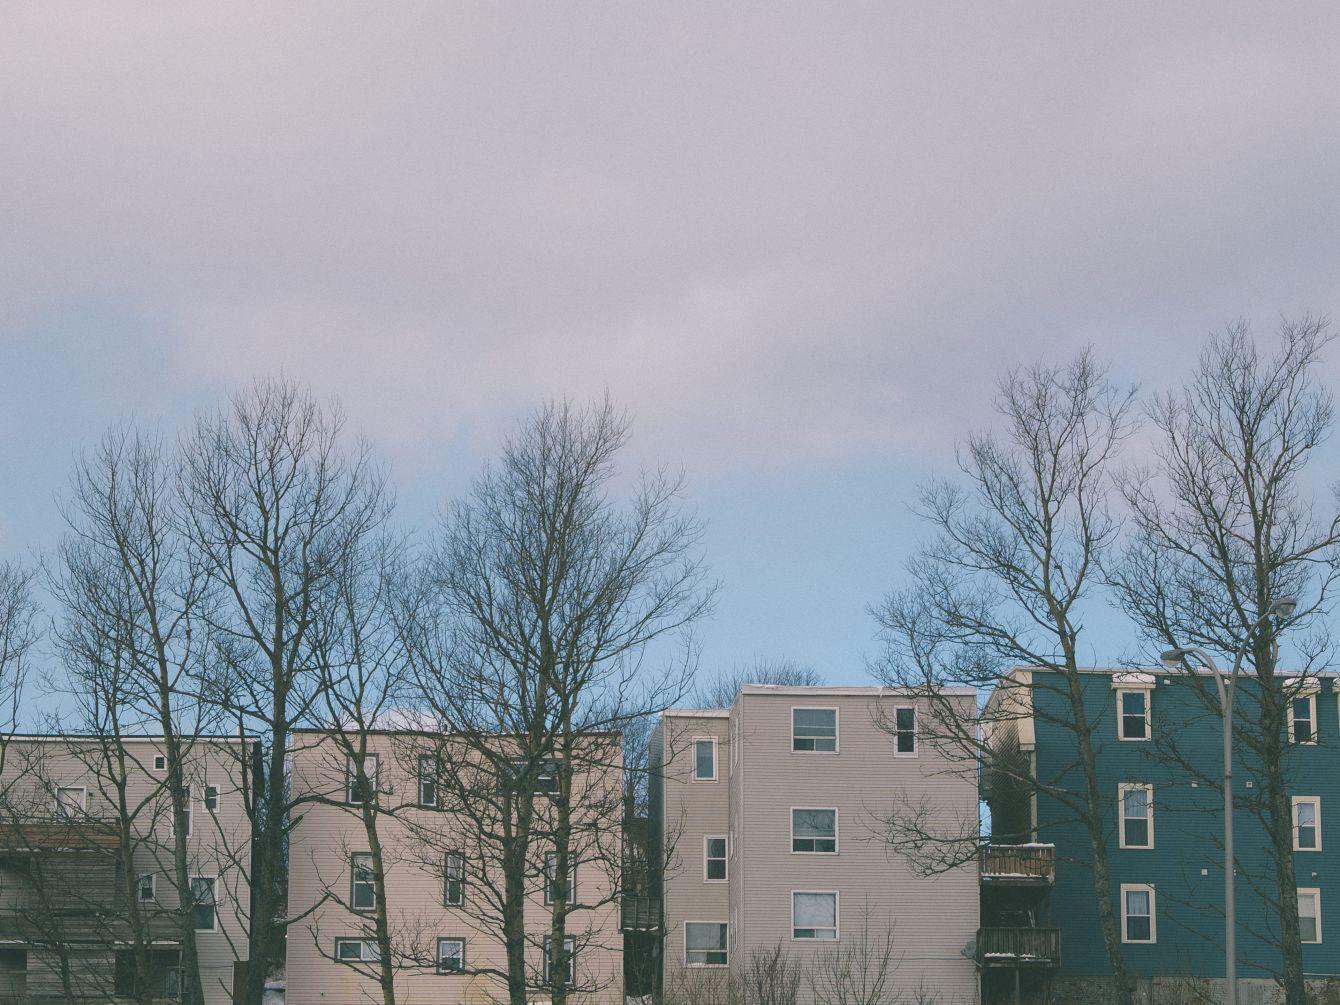 Click thumbnail to see details about photo - Saint John Apartment Buildings Photograph